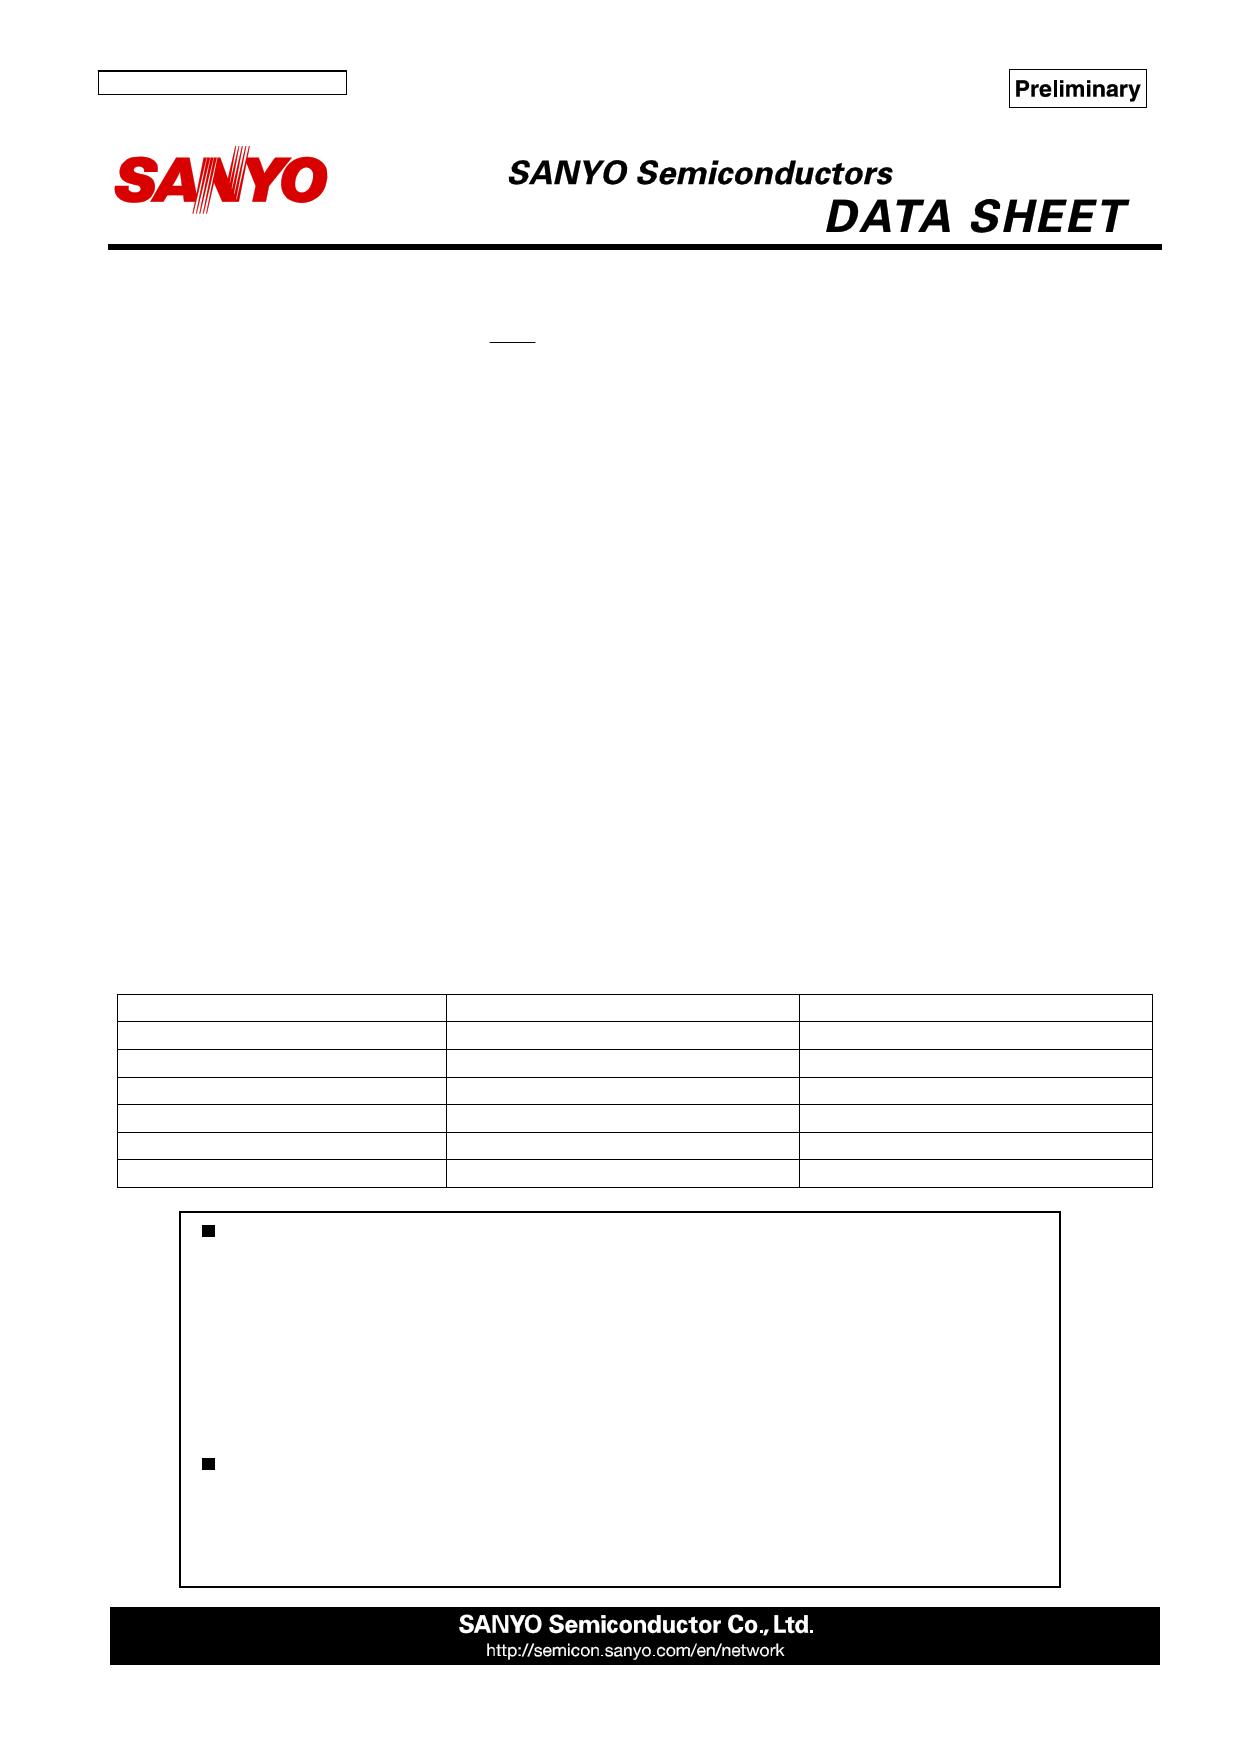 STK433-870-E image